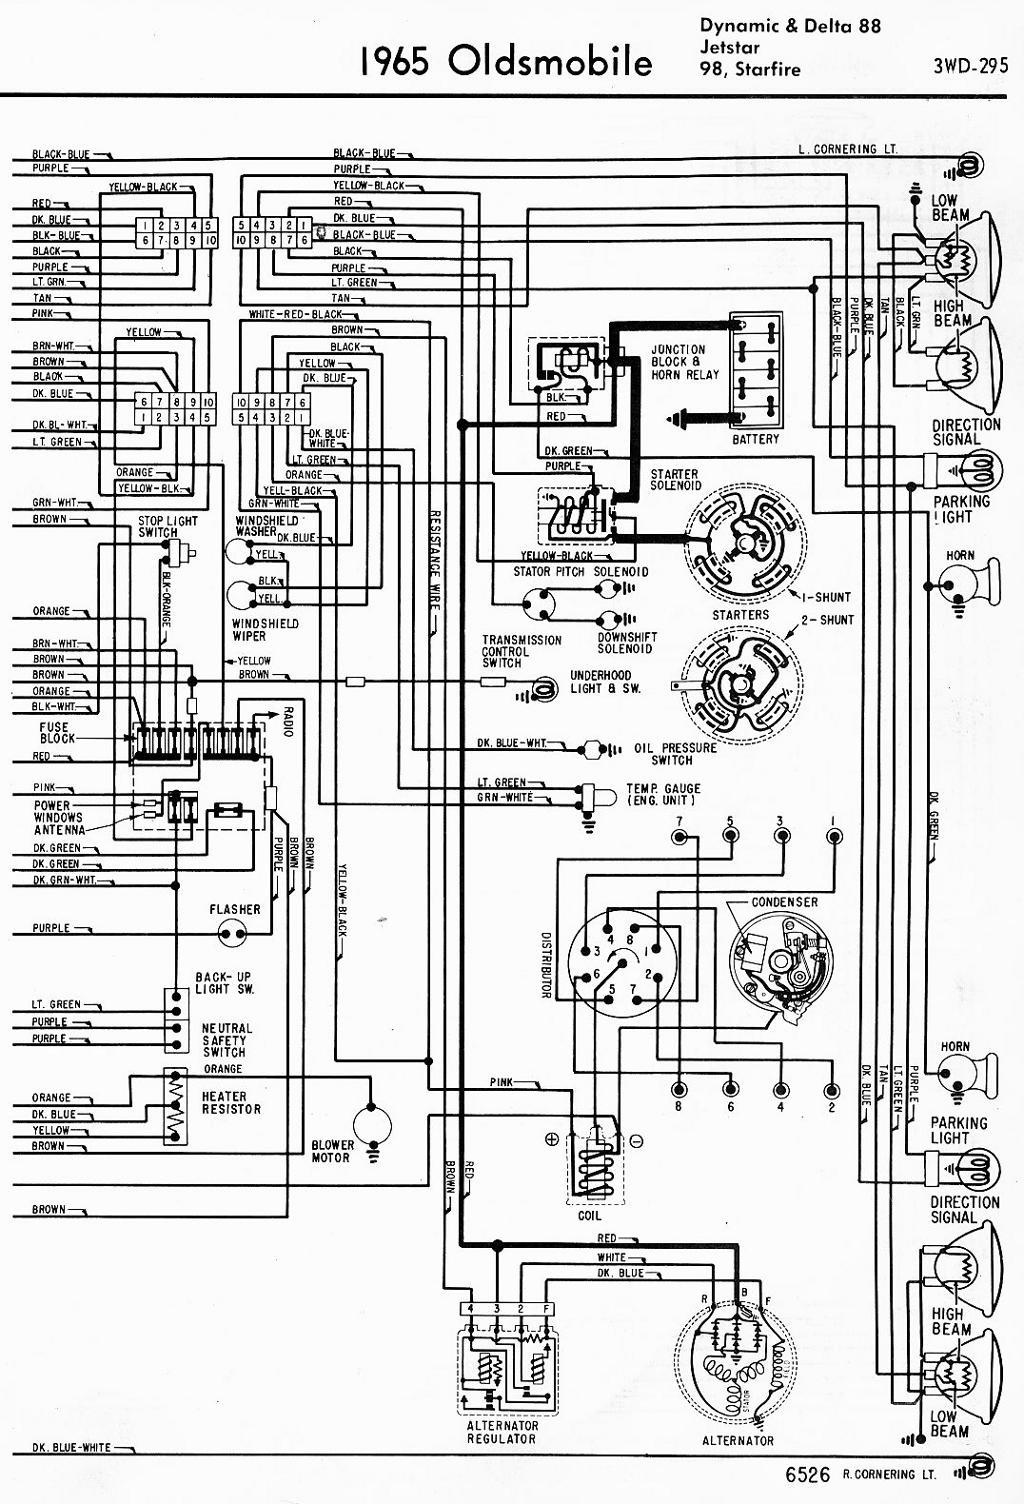 small resolution of 2001 oldsmobile silhouette fuse diagram 2007 pontiac grand prix source 2001 oldsmobile silhouette wiring diagram